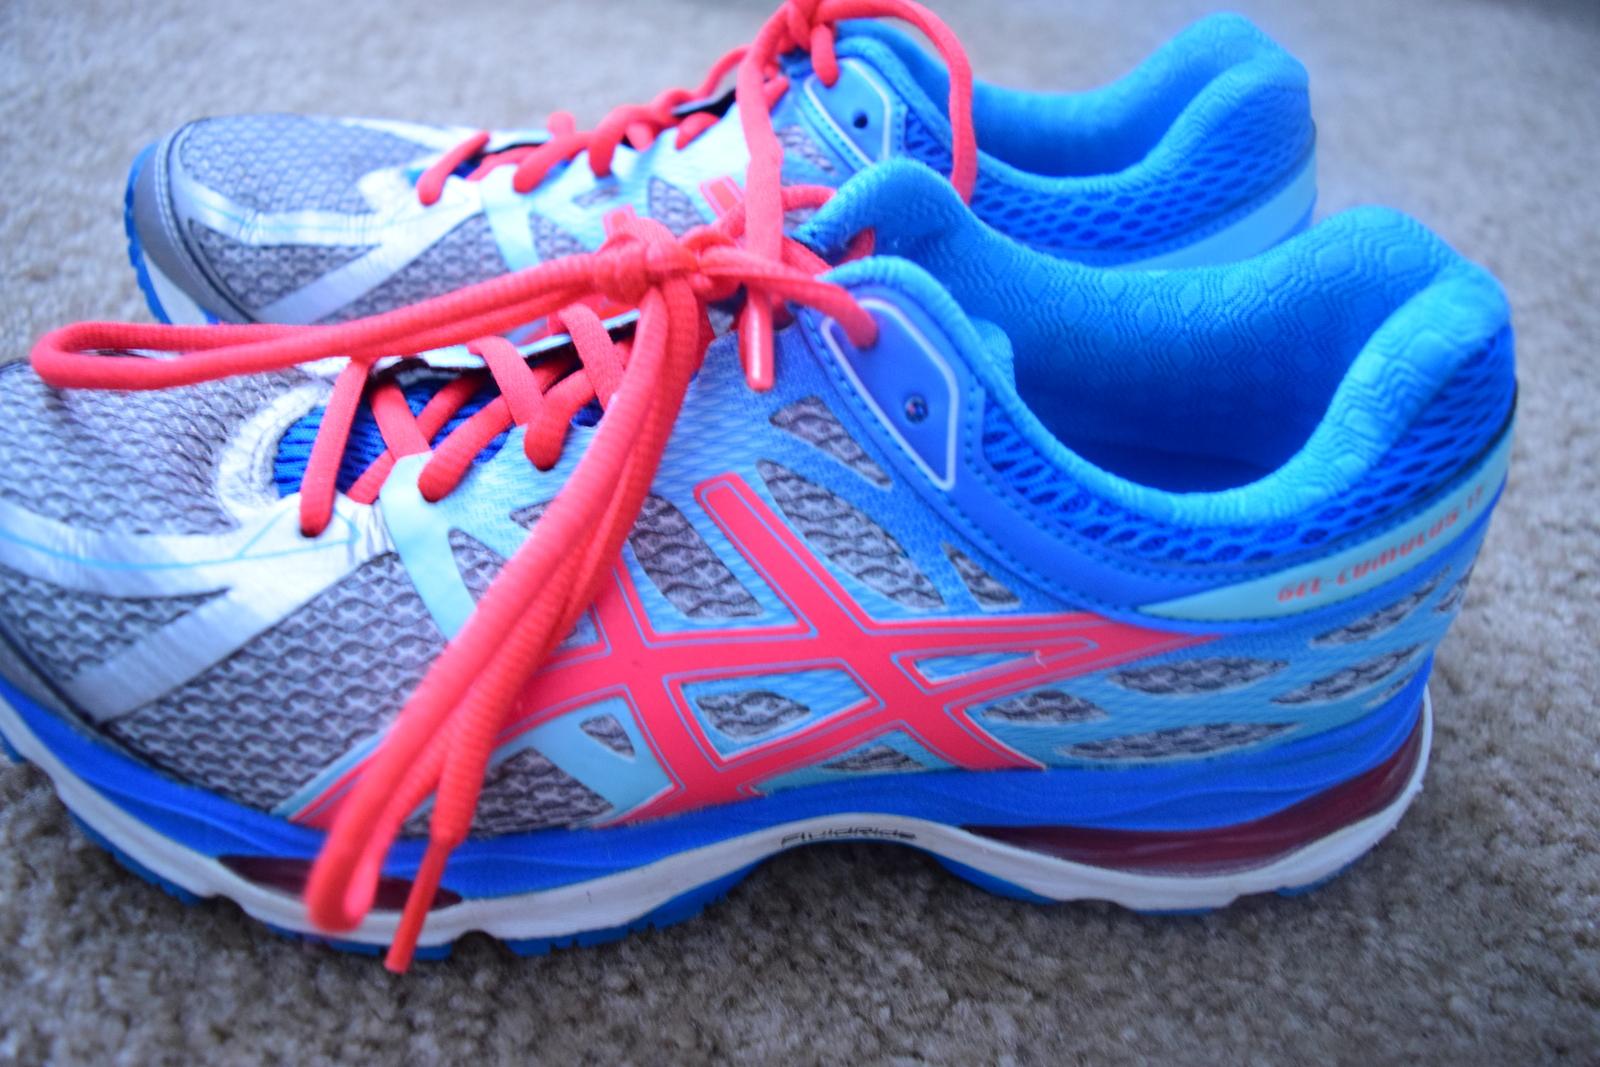 Asics Womens Running Shoes Gel Cumulus 17 Fluidride US